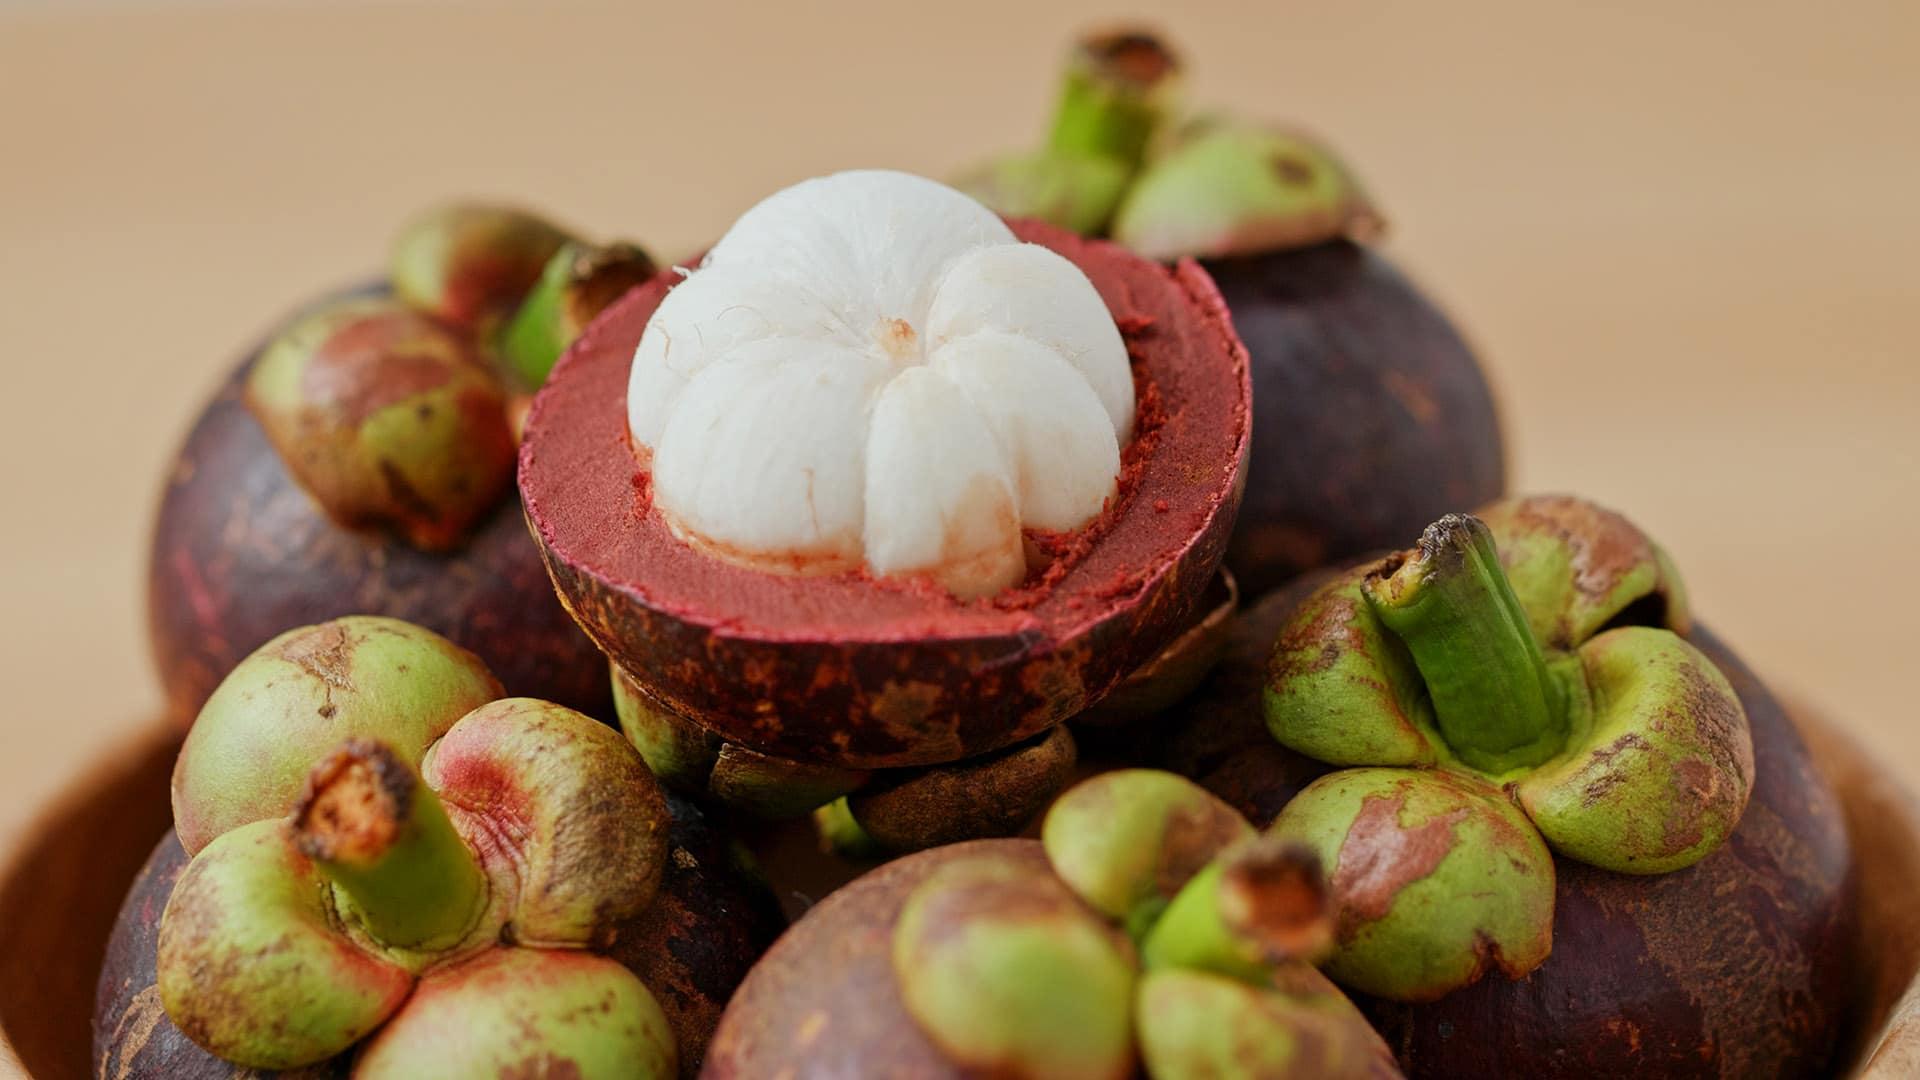 Mangostane Frucht